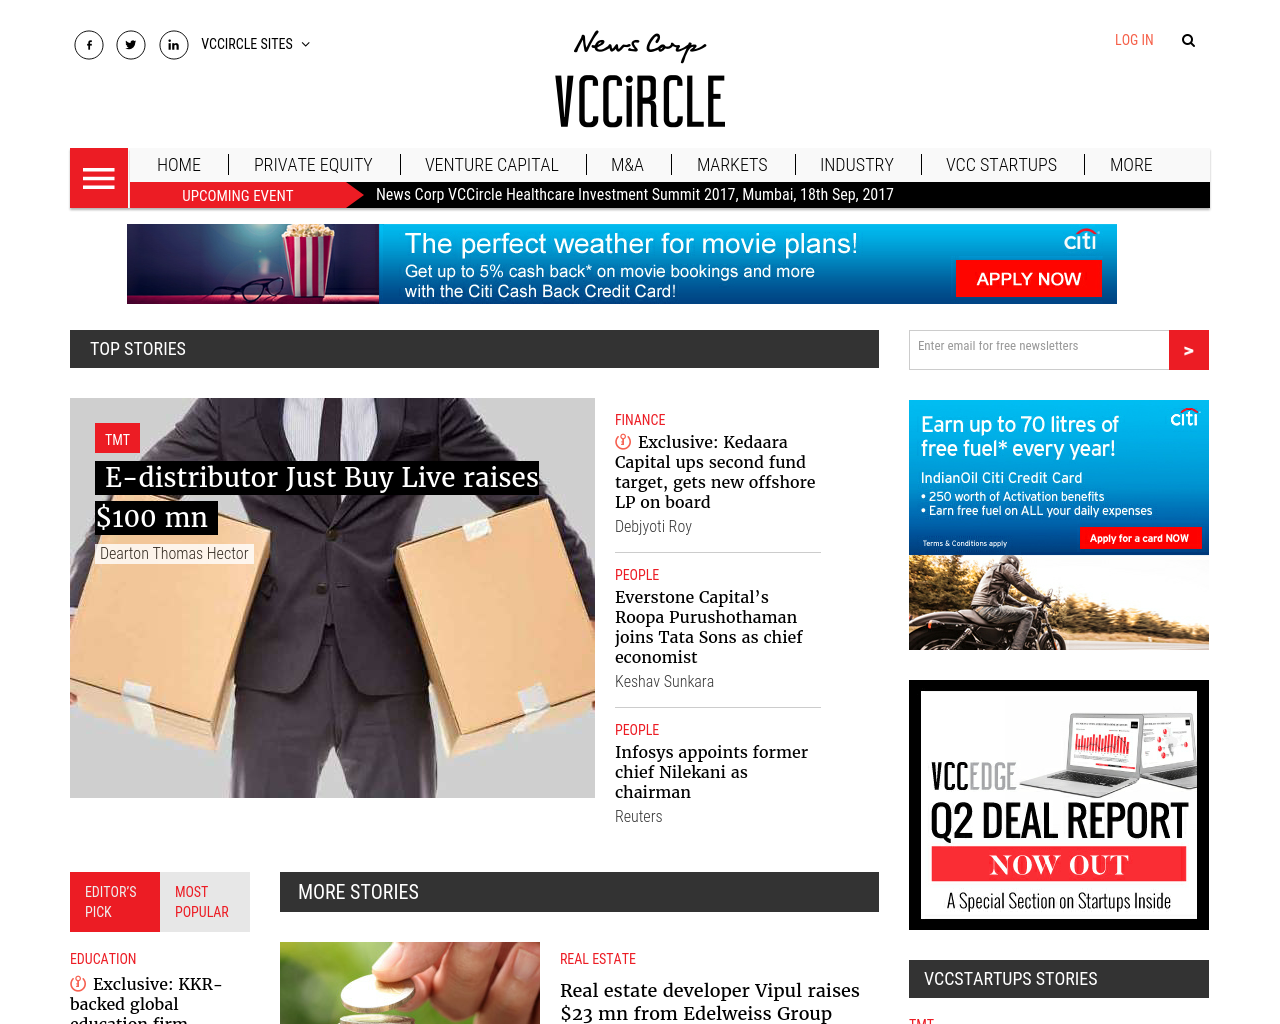 VCCircle-Advertising-Reviews-Pricing